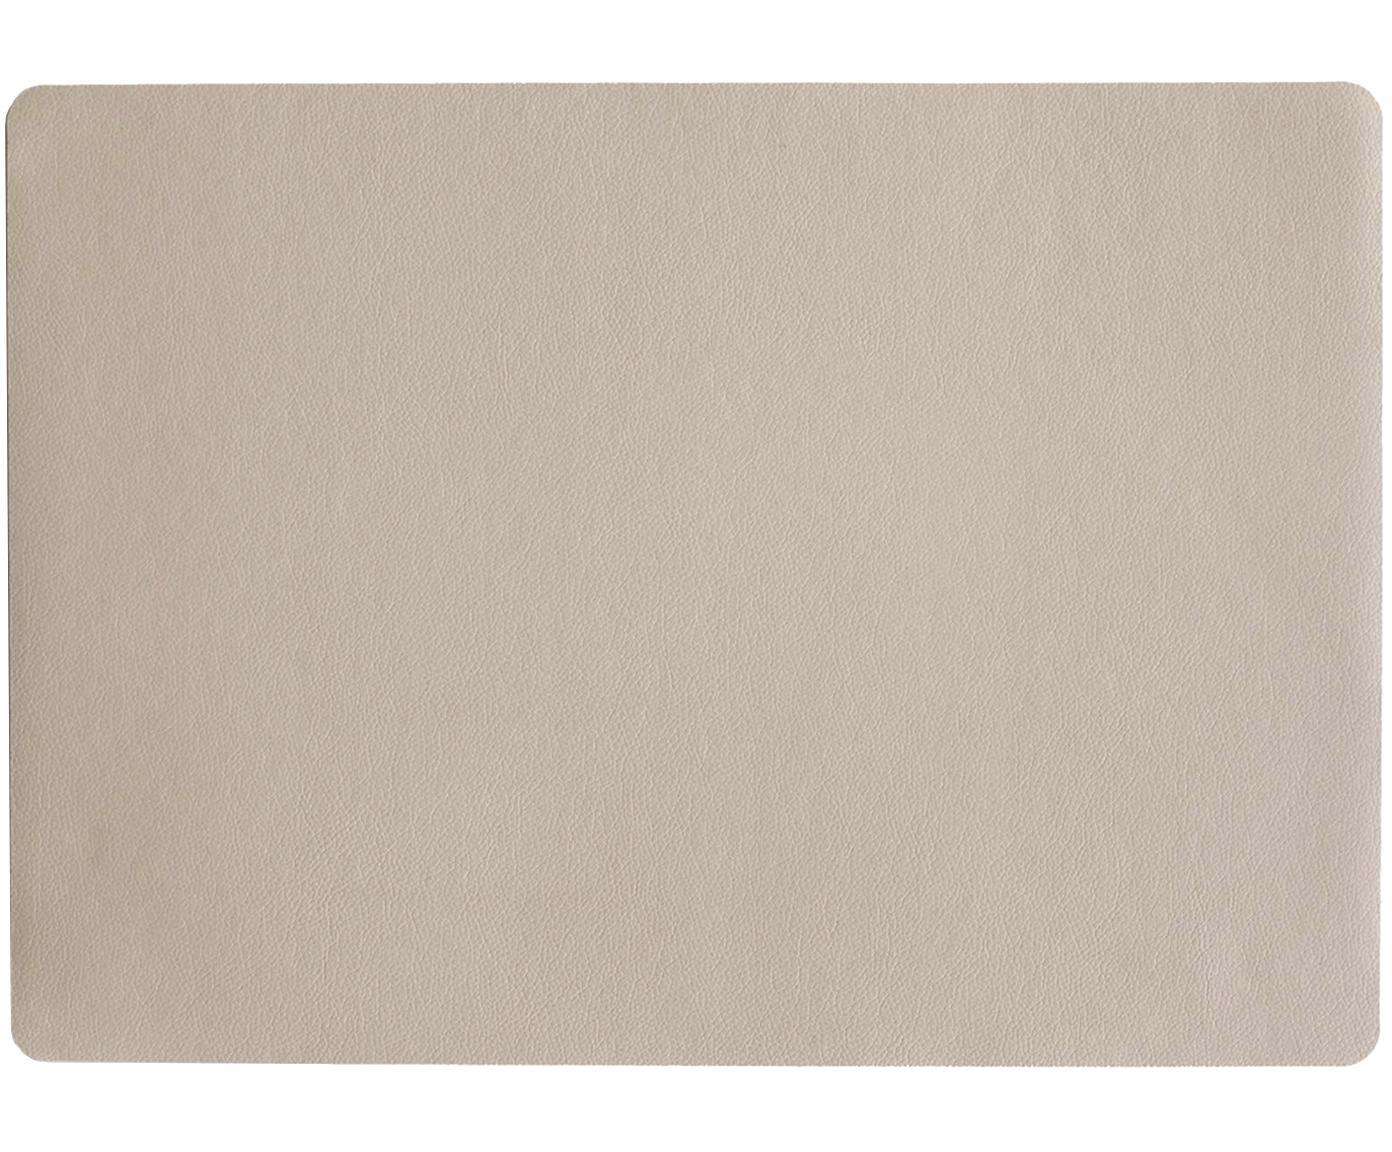 Manteles individuales de cuero sintético Pik, 2uds., Plástico (PVC) es aspecto de cuero, Beige, An 33x L 46 cm